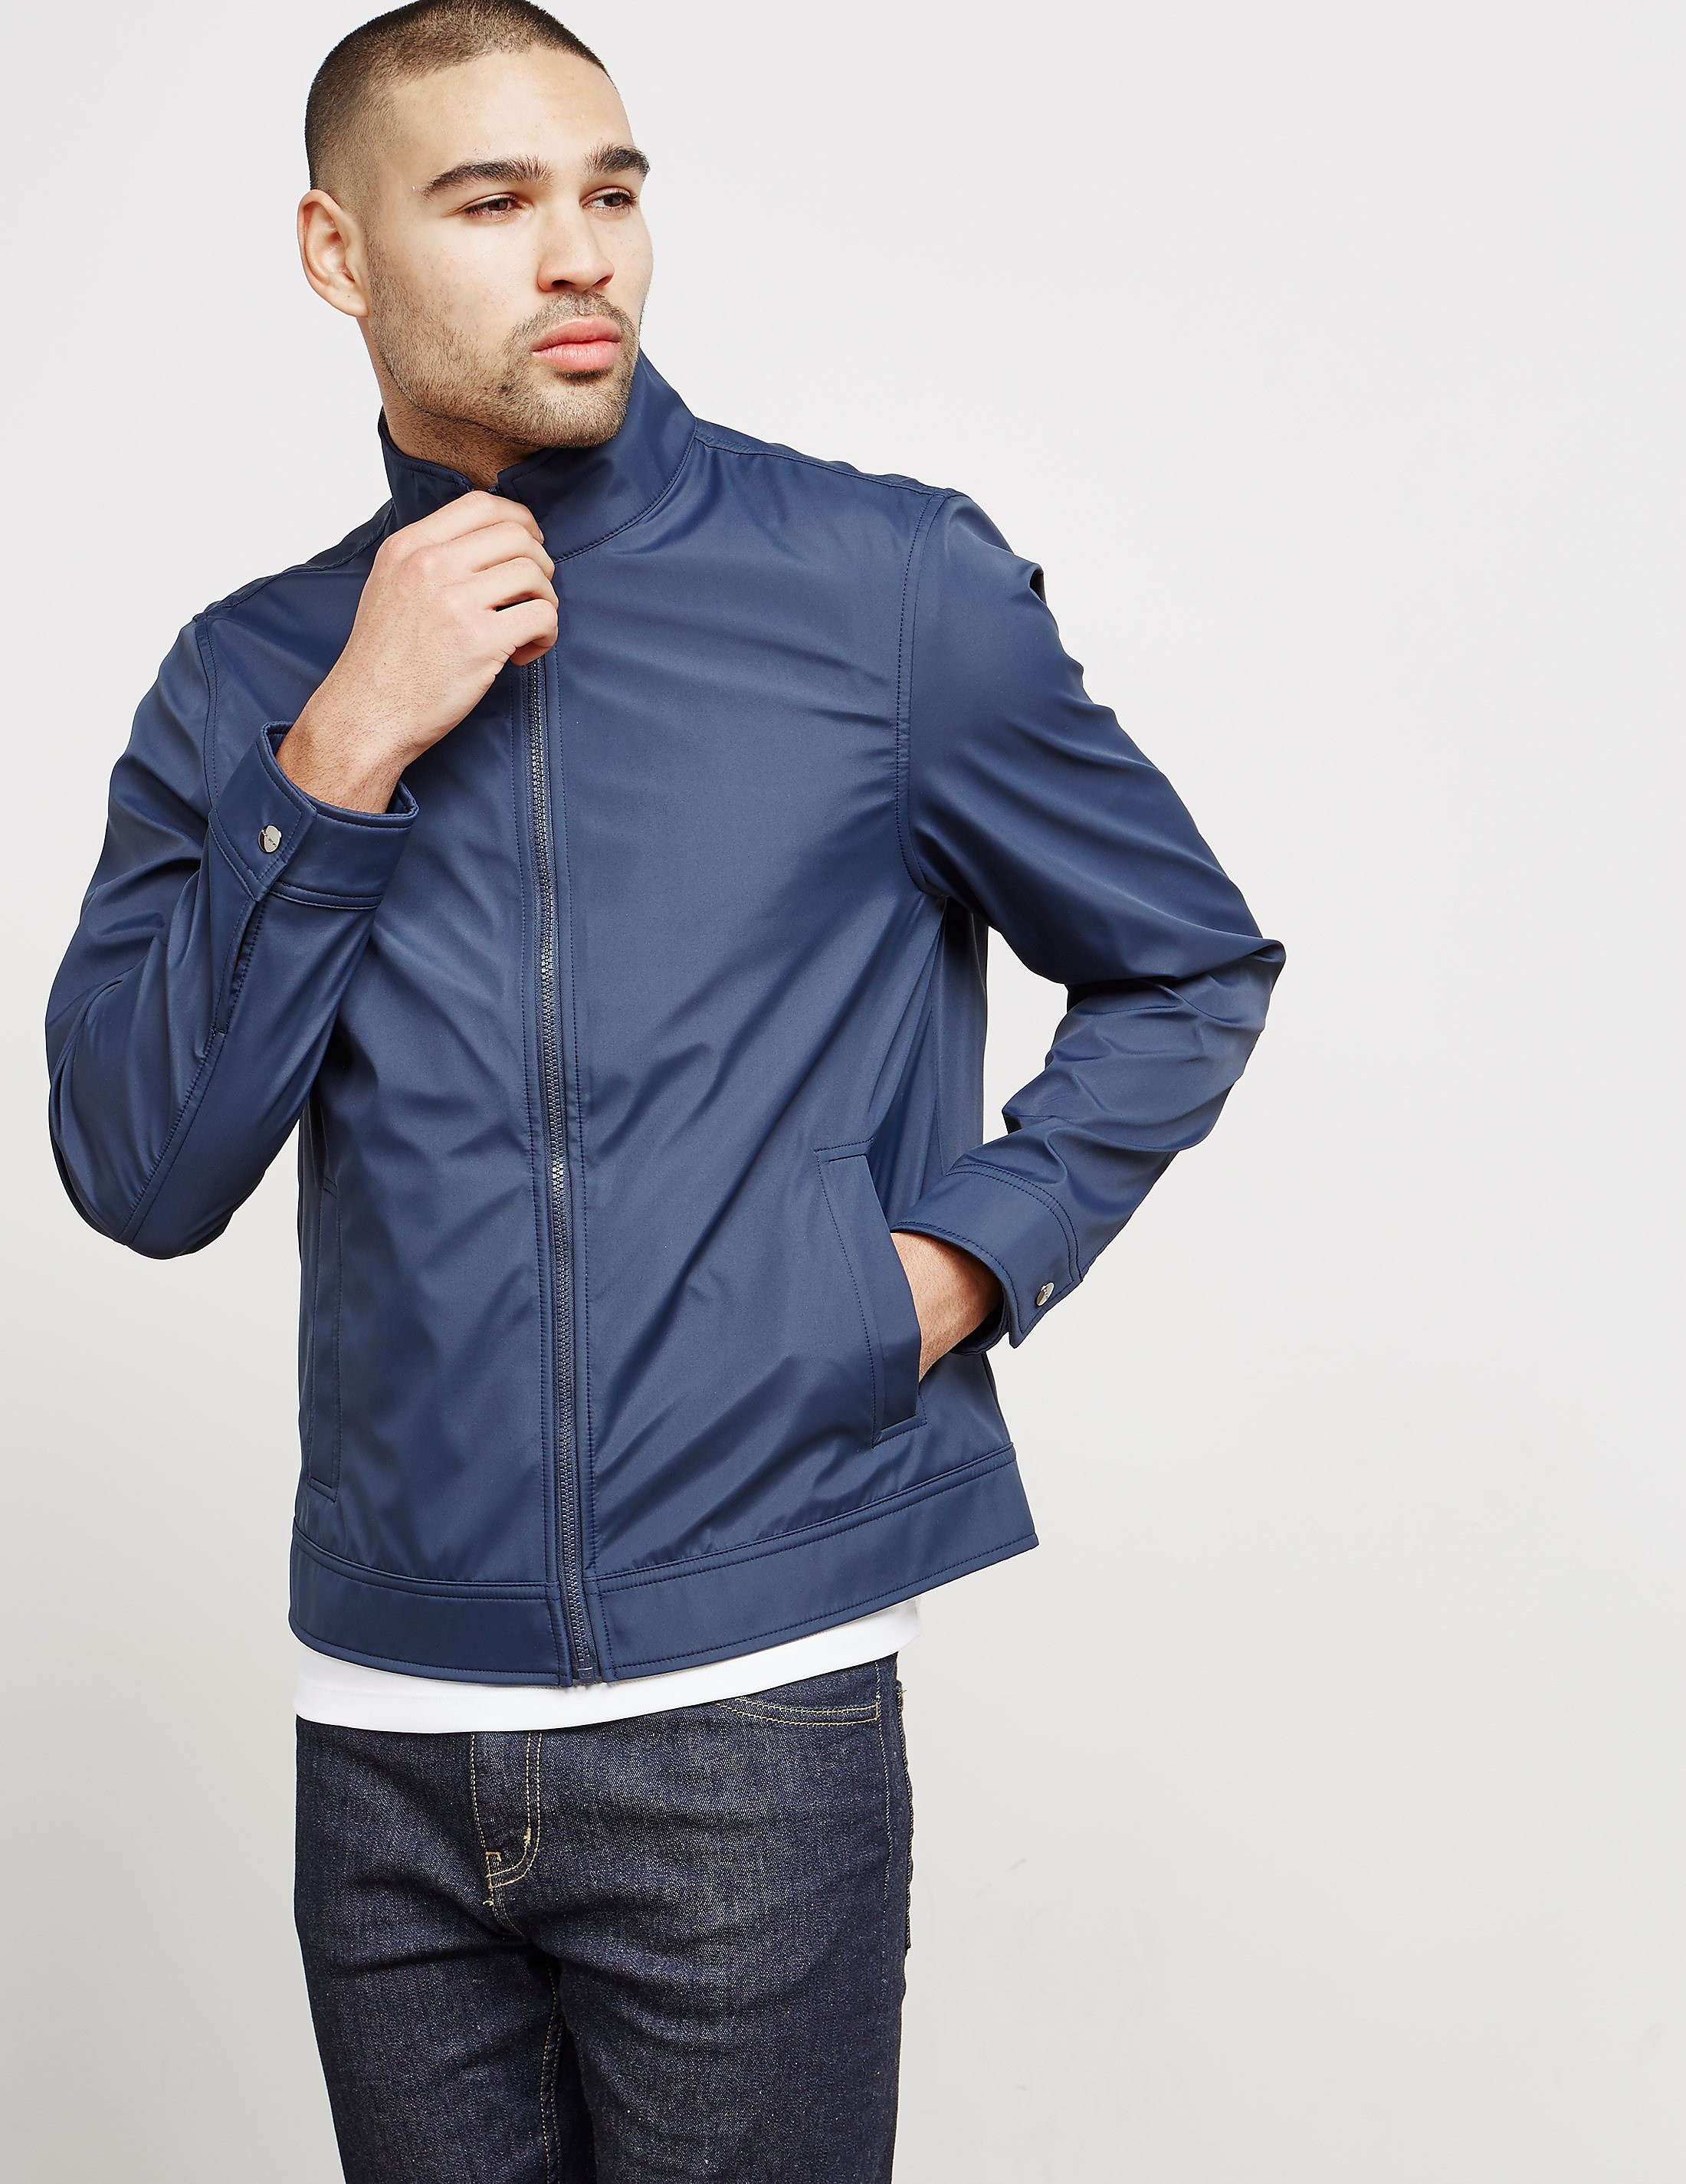 Michael Kors Lightweight Quilted Harrington Jacket